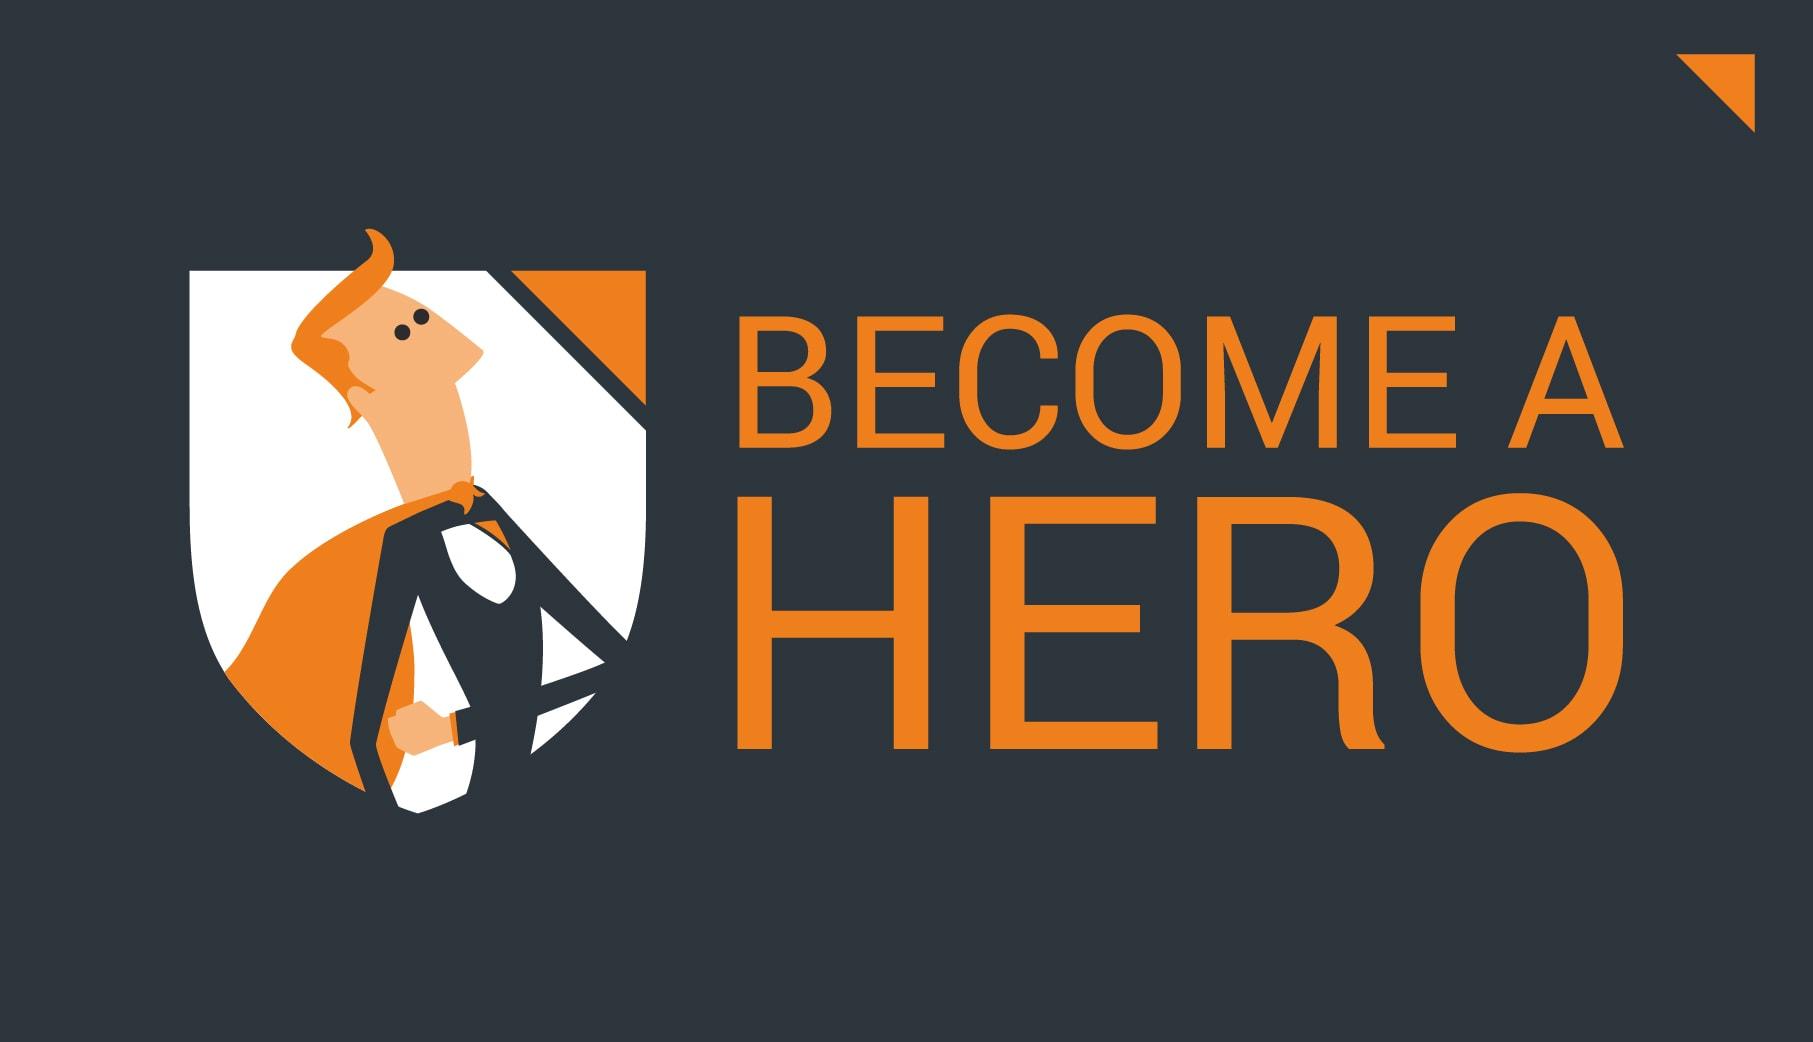 Become a Hero12: usd Onboarding Programm 2020 startet